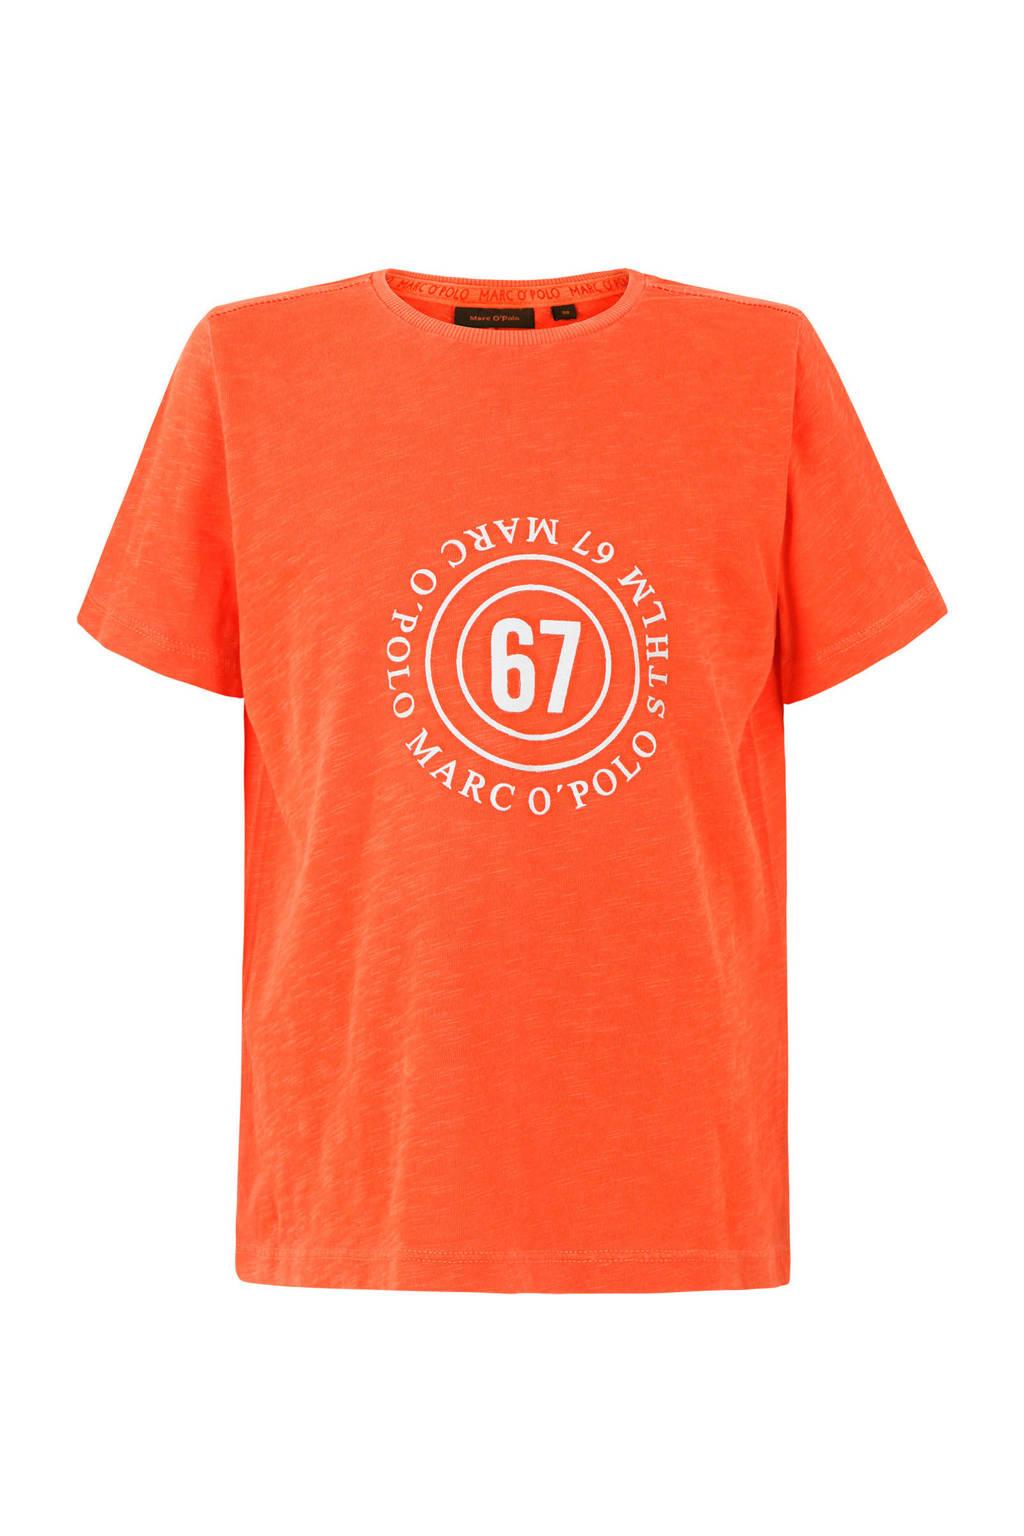 Marc O'Polo T-shirt met printopdruk oranje, Oranje